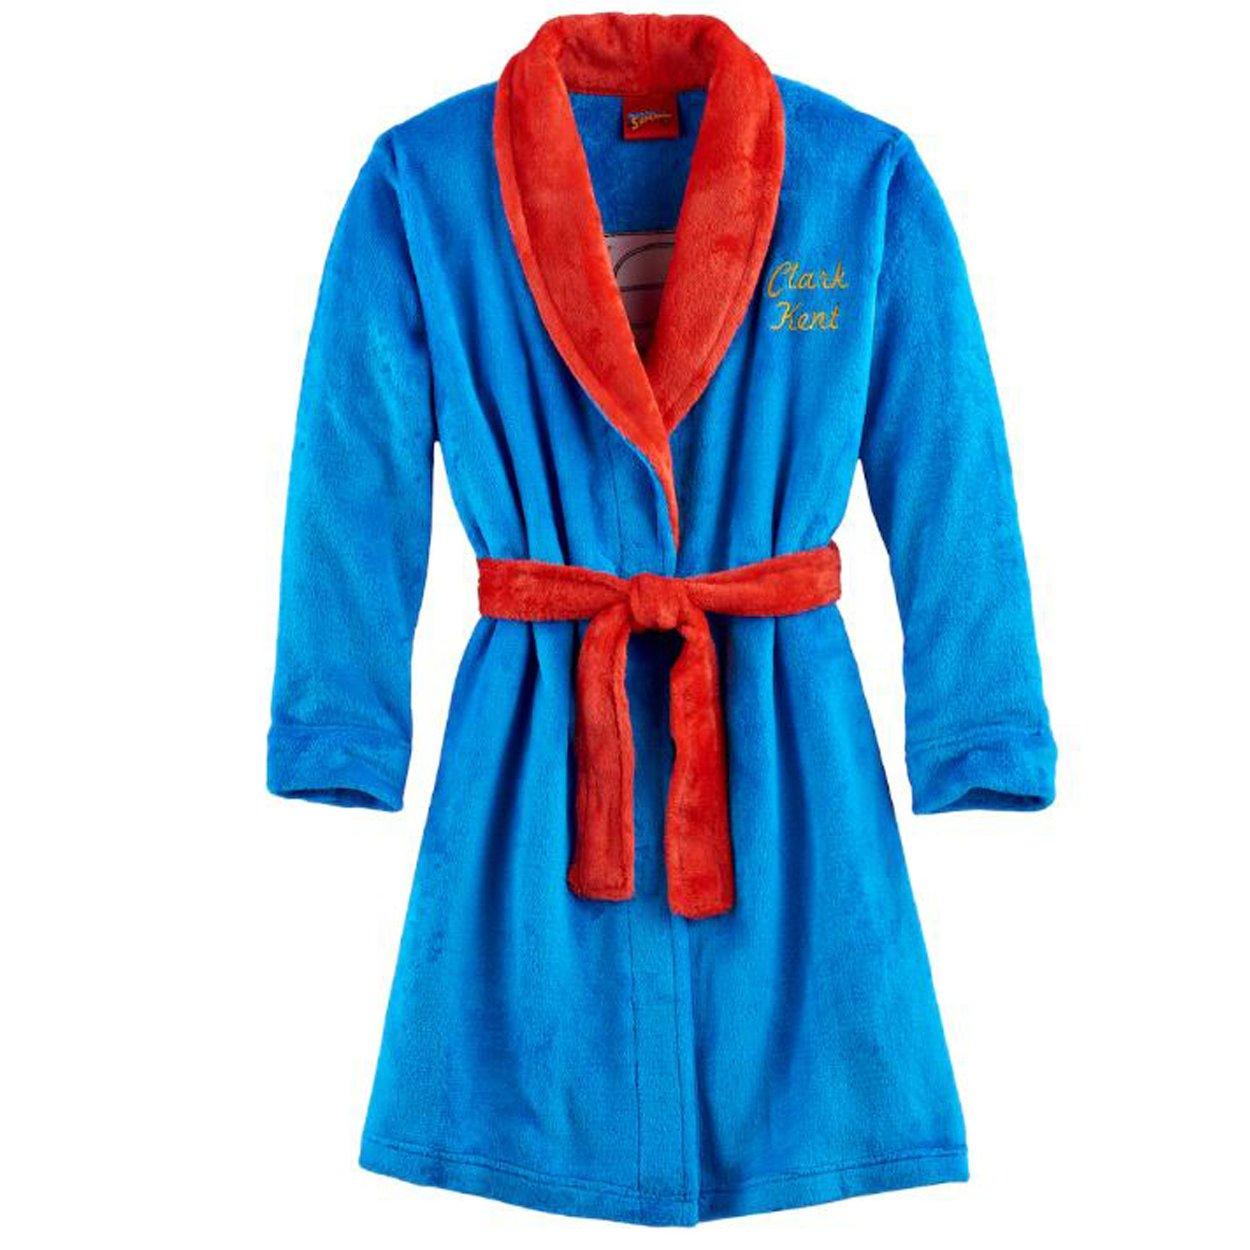 Komar Kids Superman Boys Fleece Bathrobe Robe (Medium/8, Blue) by Komar Kids (Image #1)